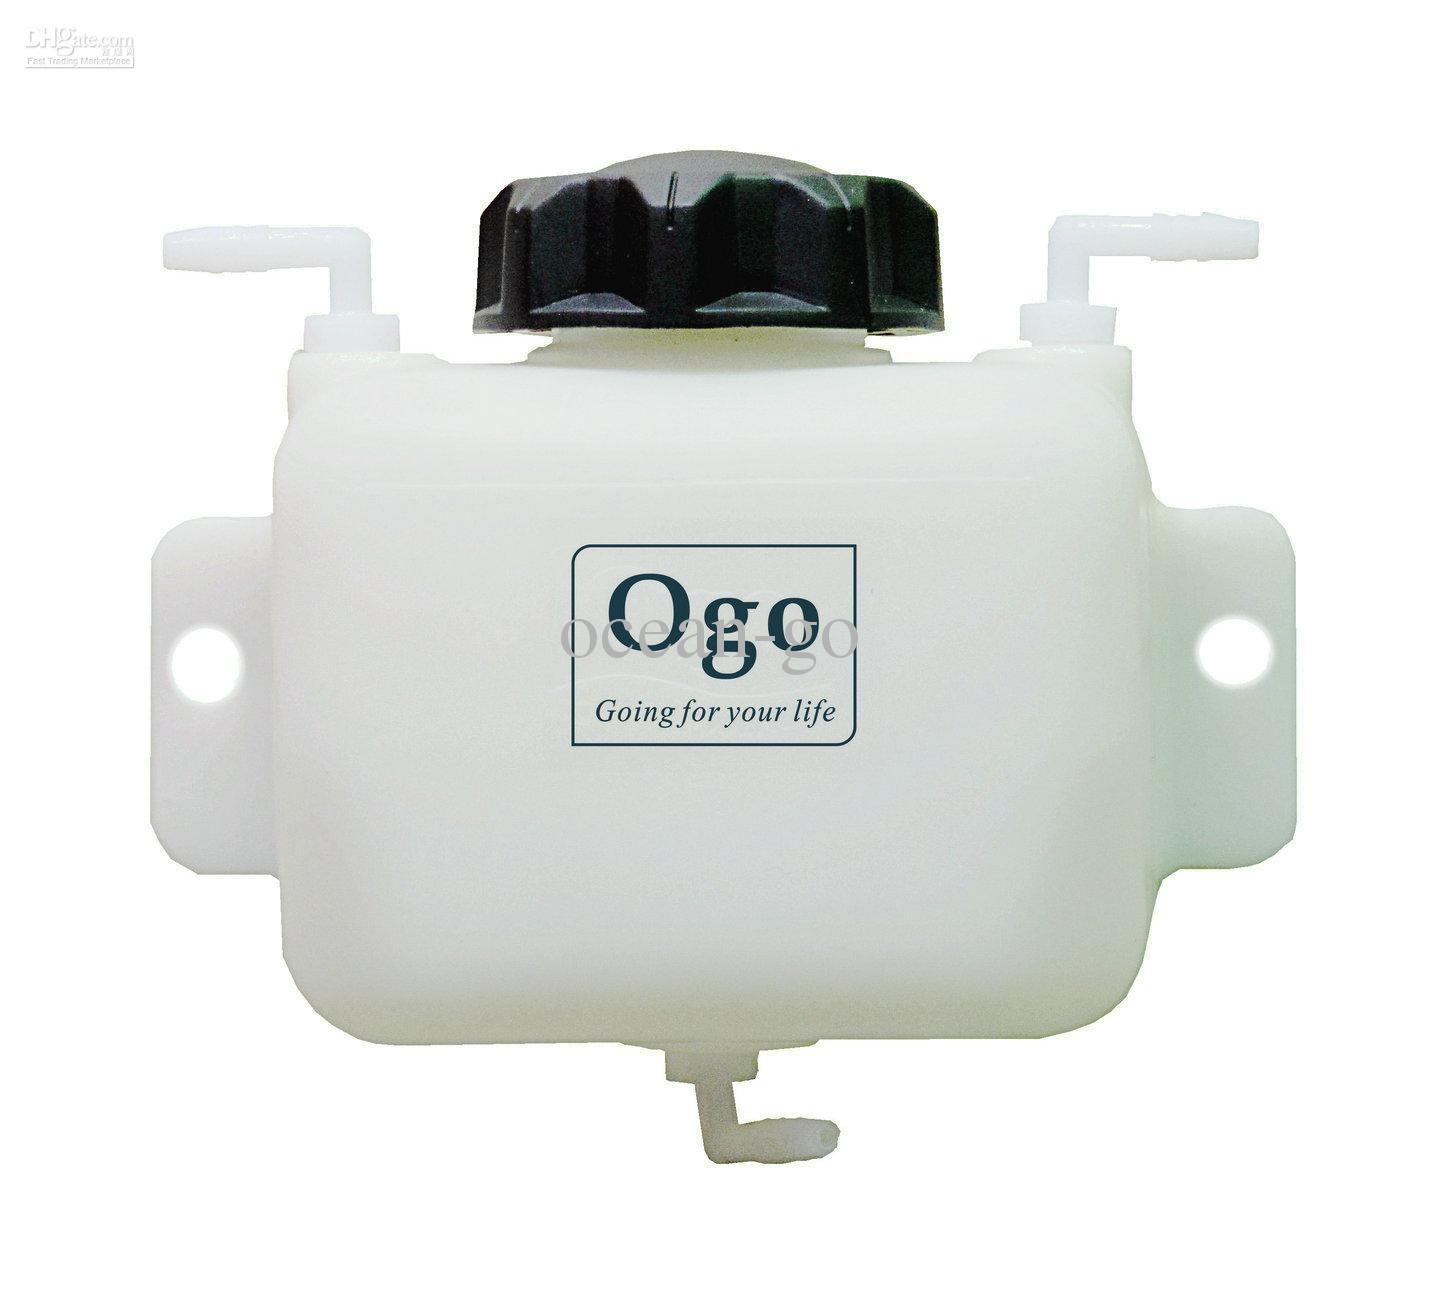 2018 Ogo 1 2lhho Water Reservoir Bubbler Tank Car Water